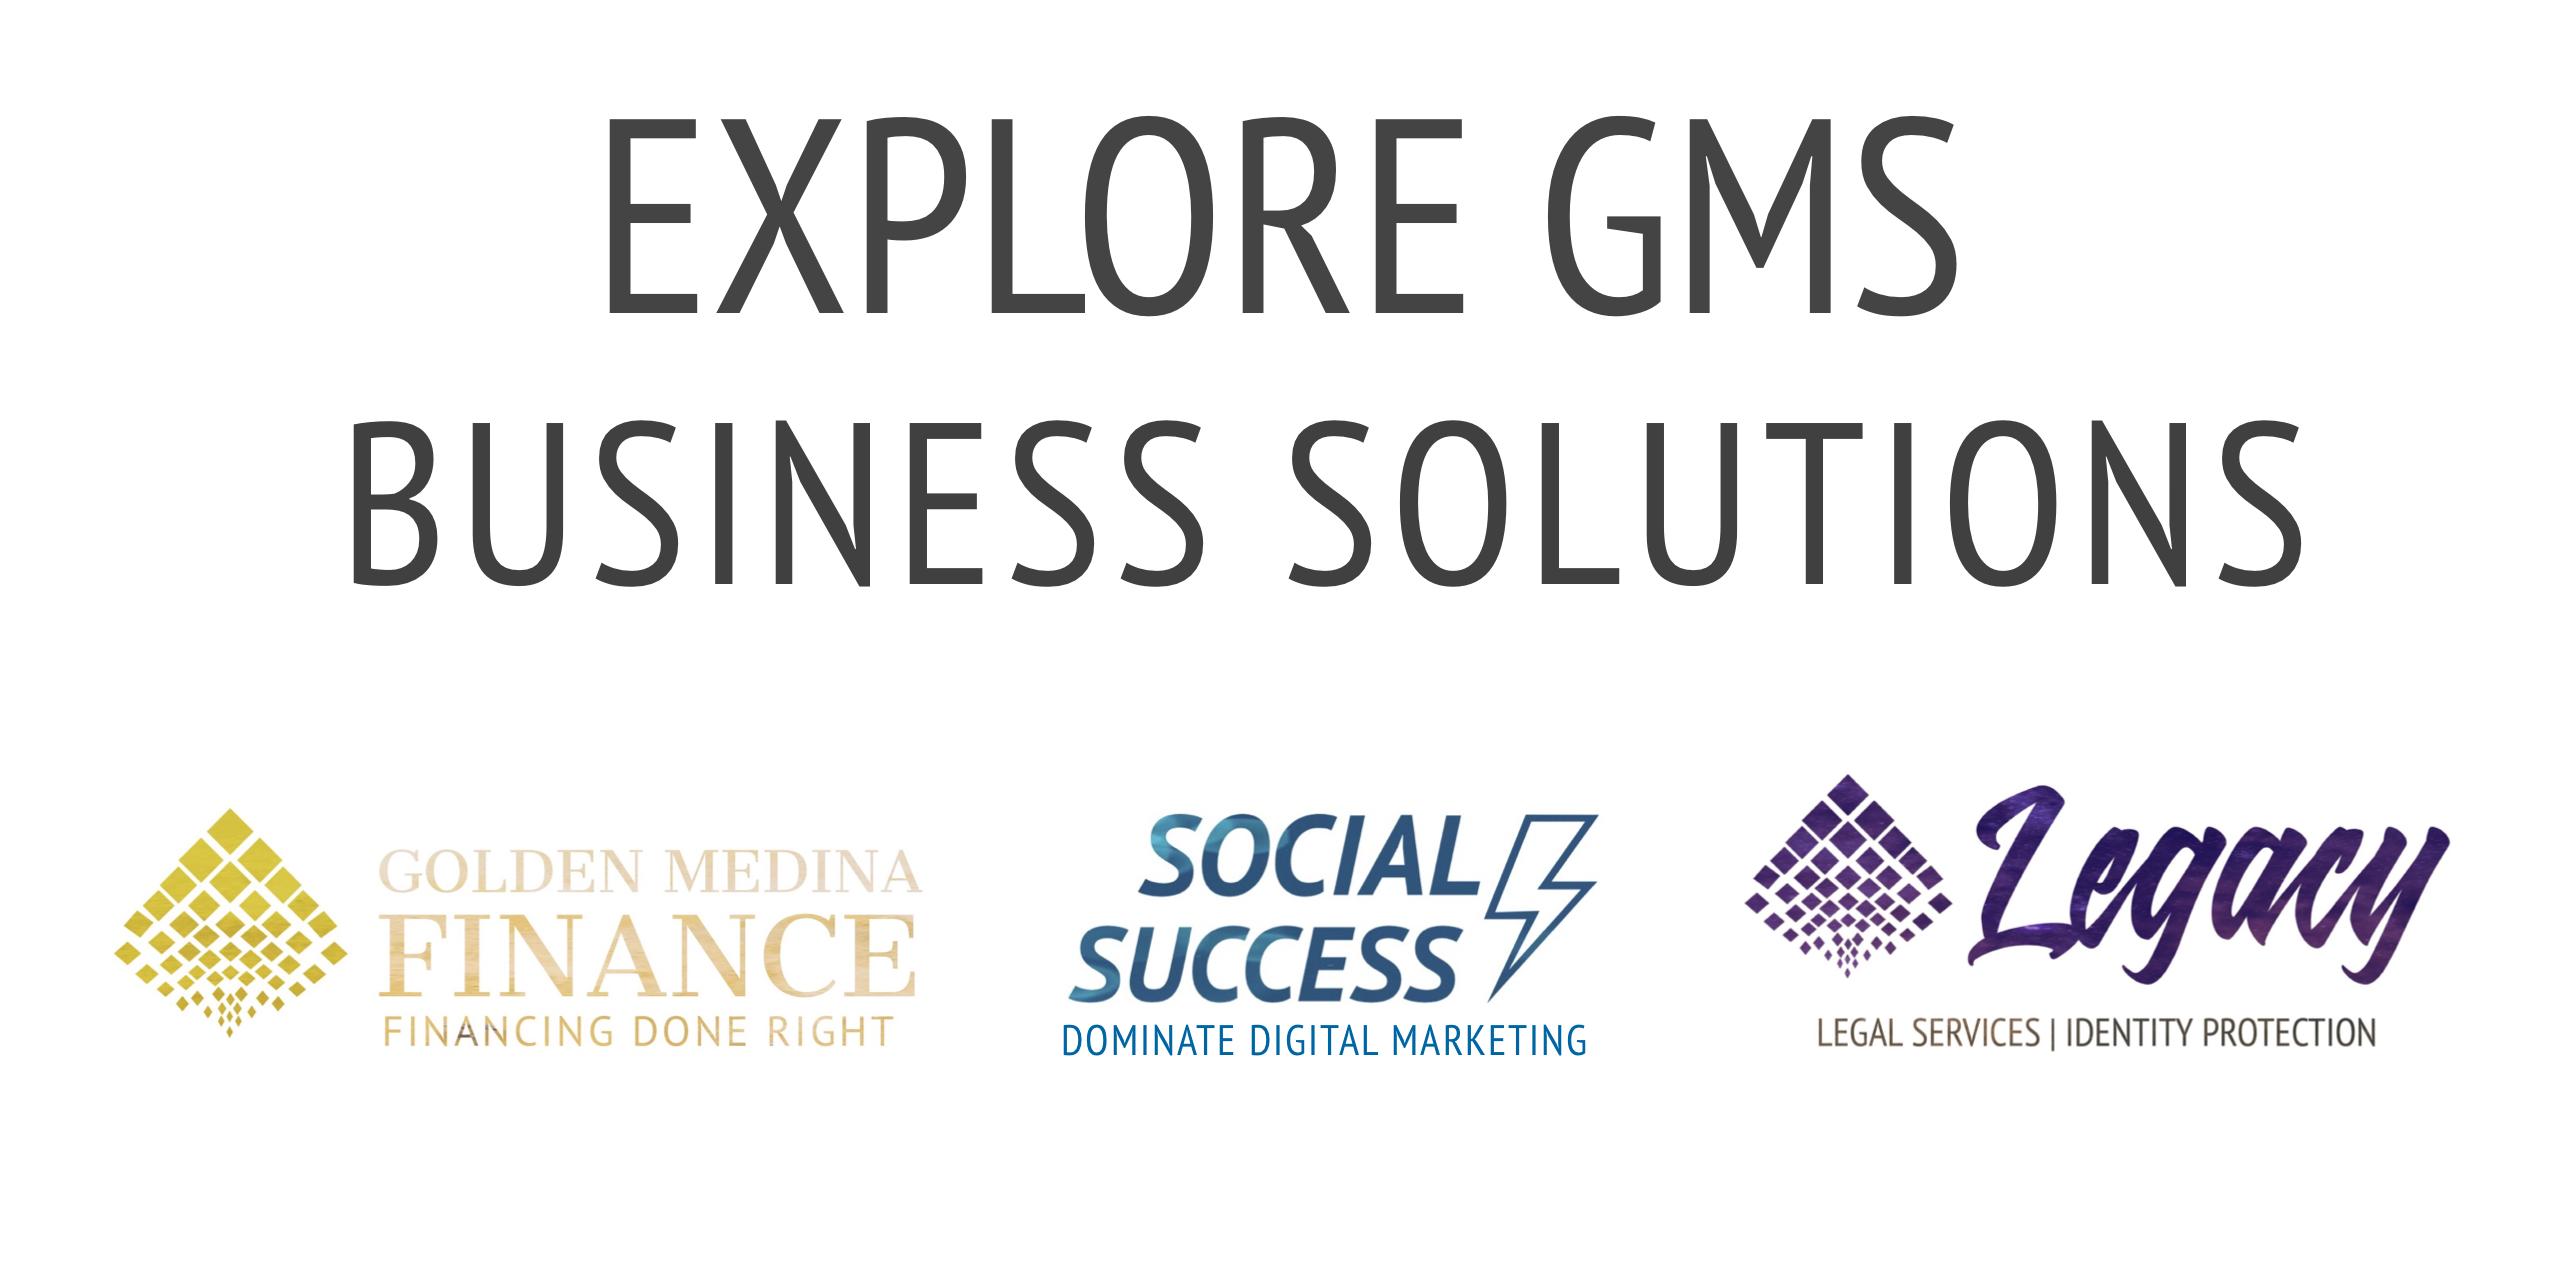 Explore GMS Business Solutions